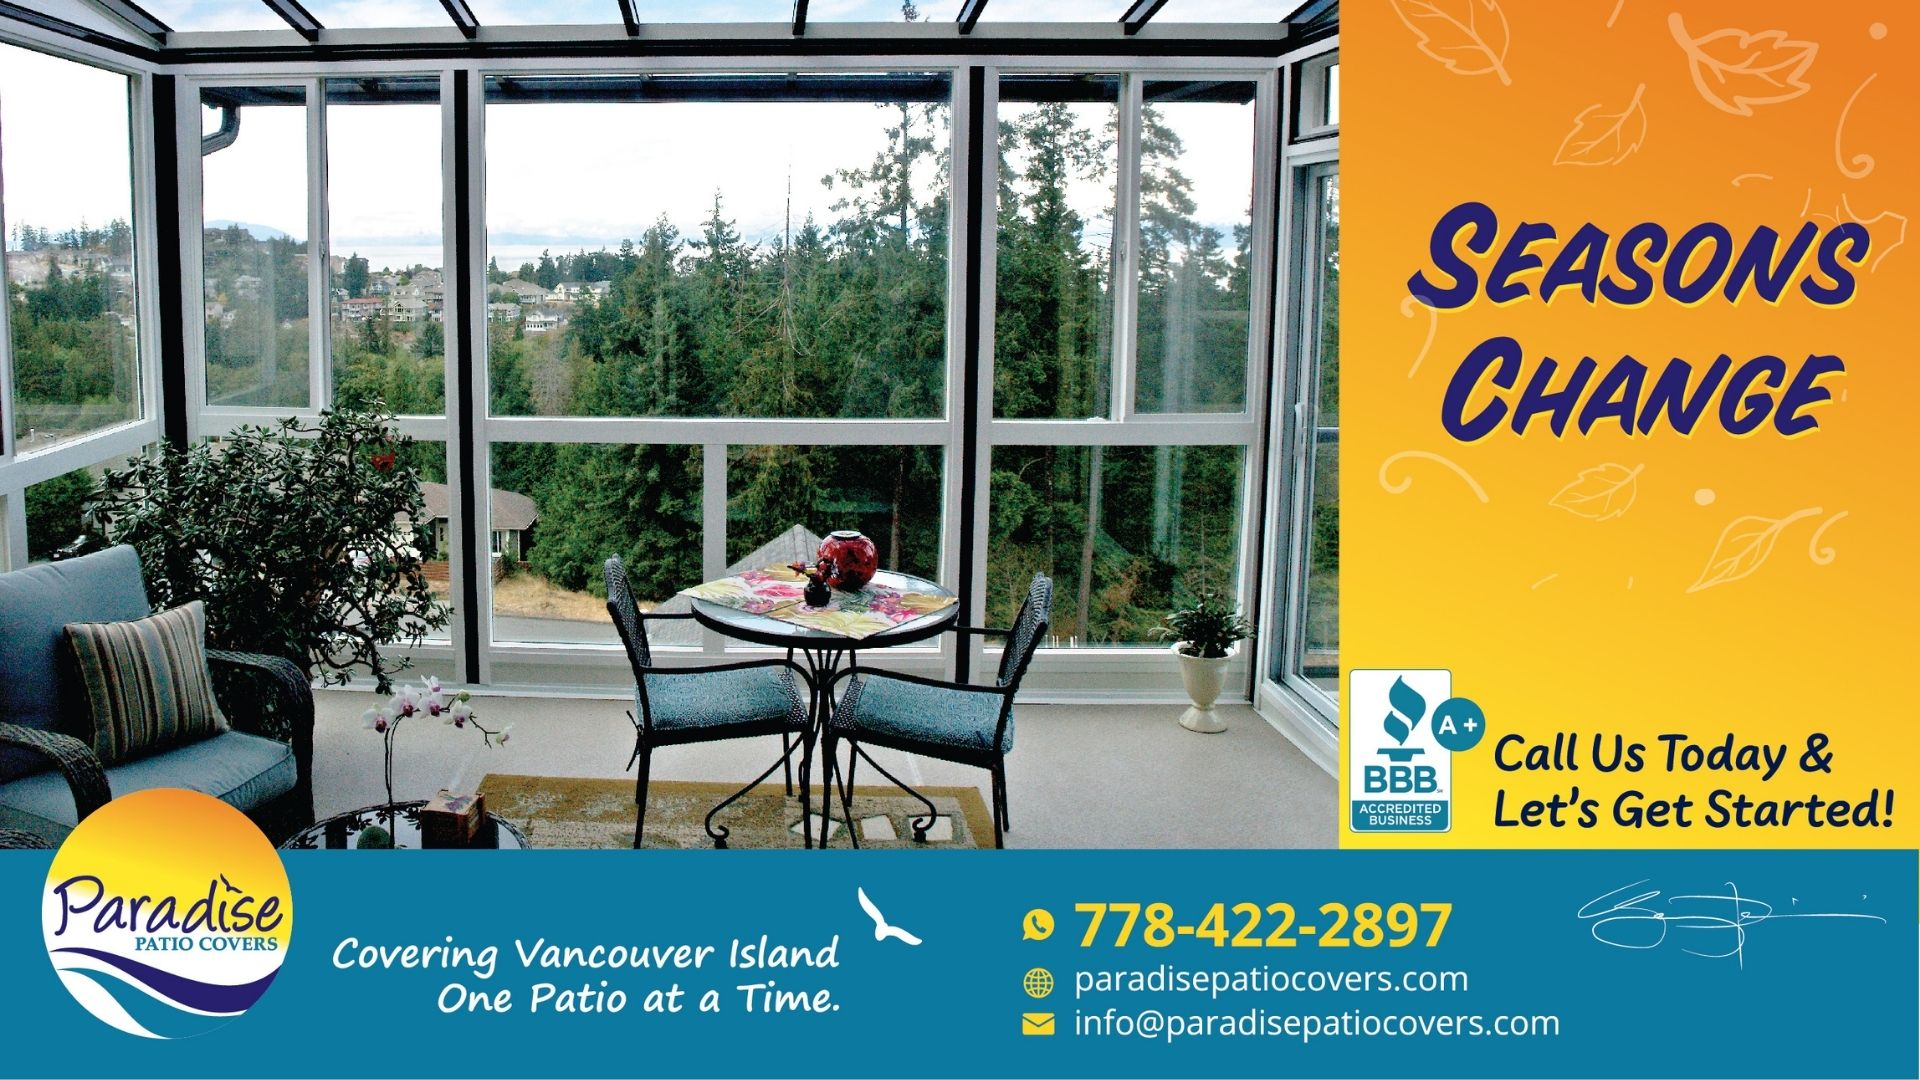 paradise patio covers - seasons change